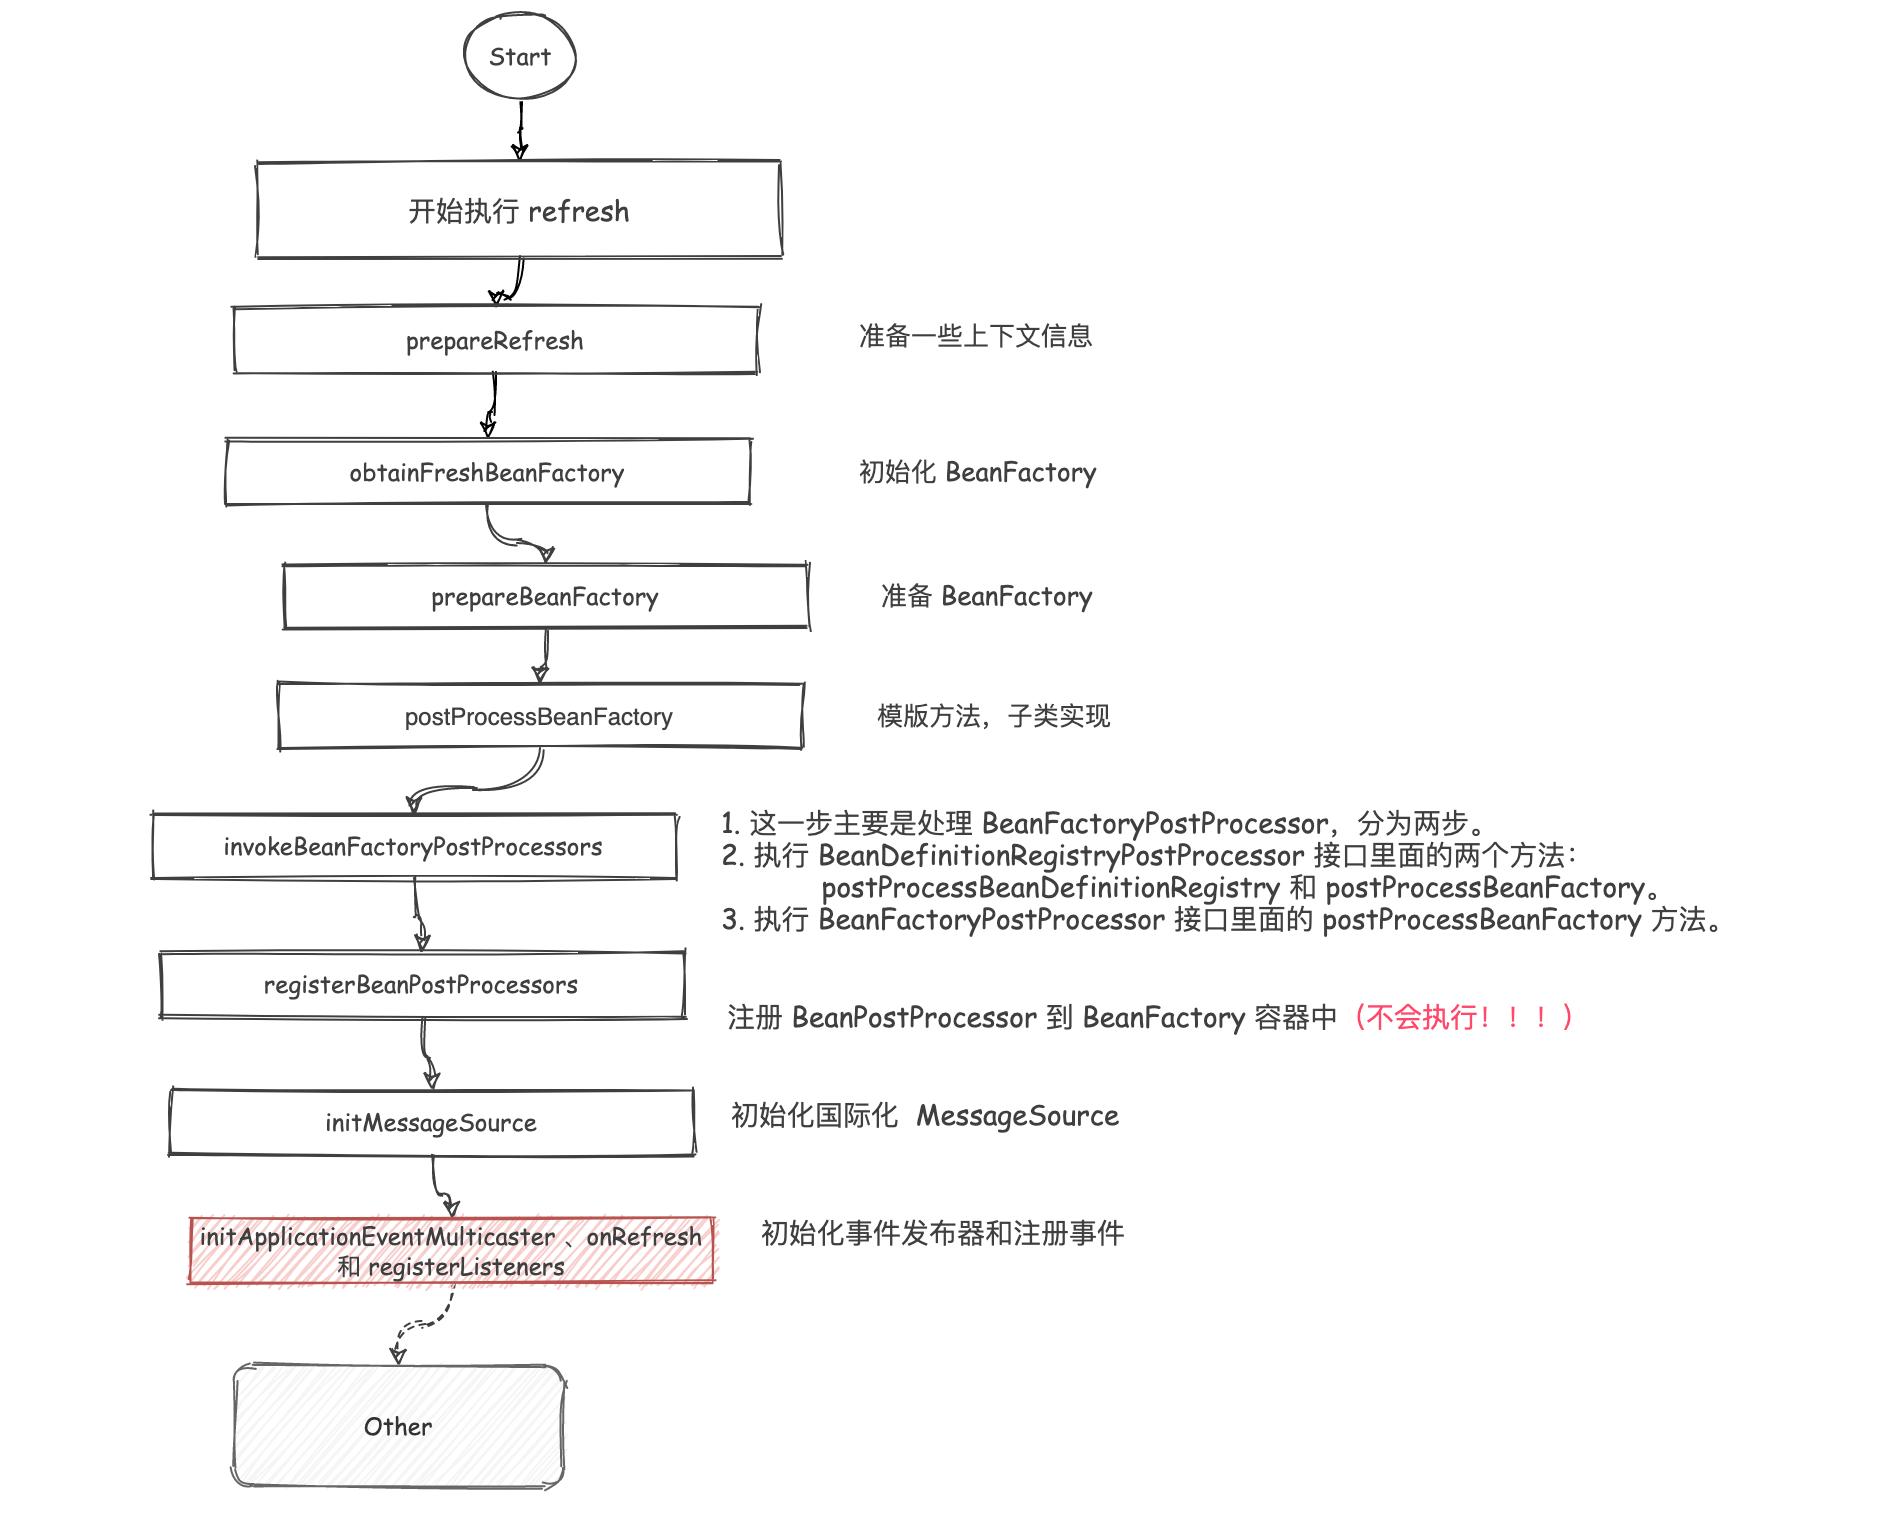 Spring 源码学习 14:initApplicationEventMulticaster 、onRefresh 和 registerListeners